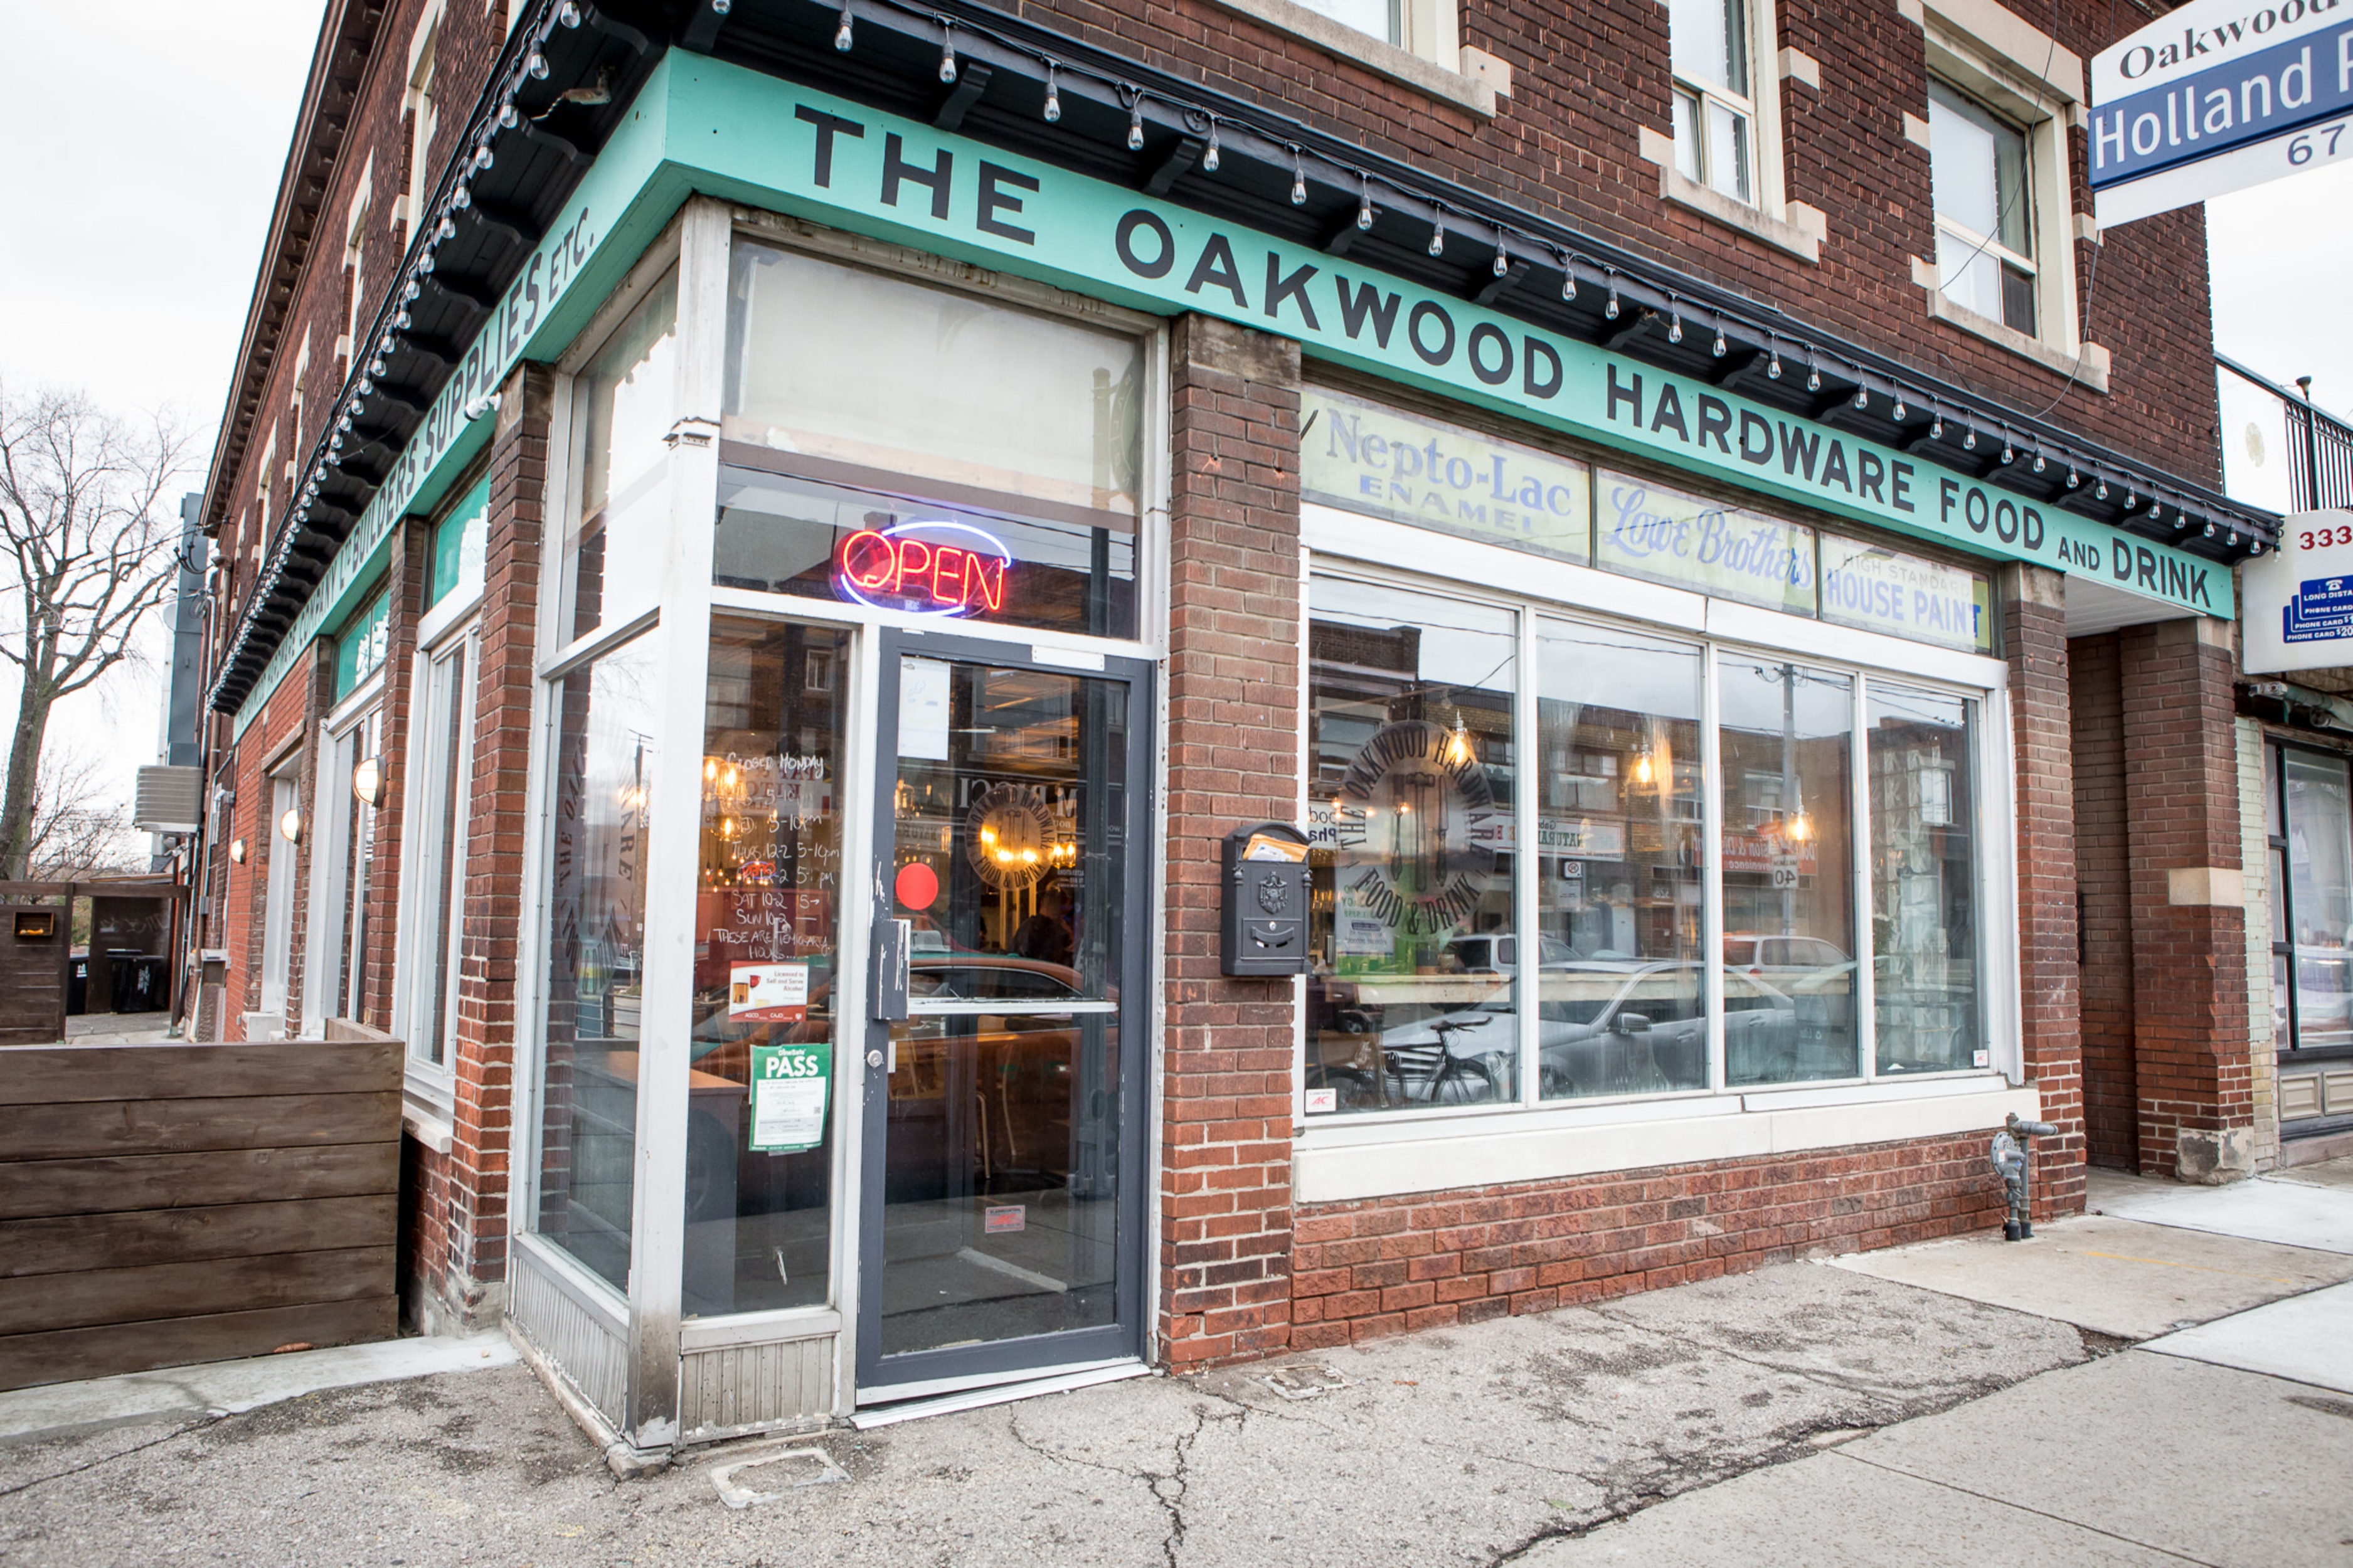 Oakwood Hardware Toronto